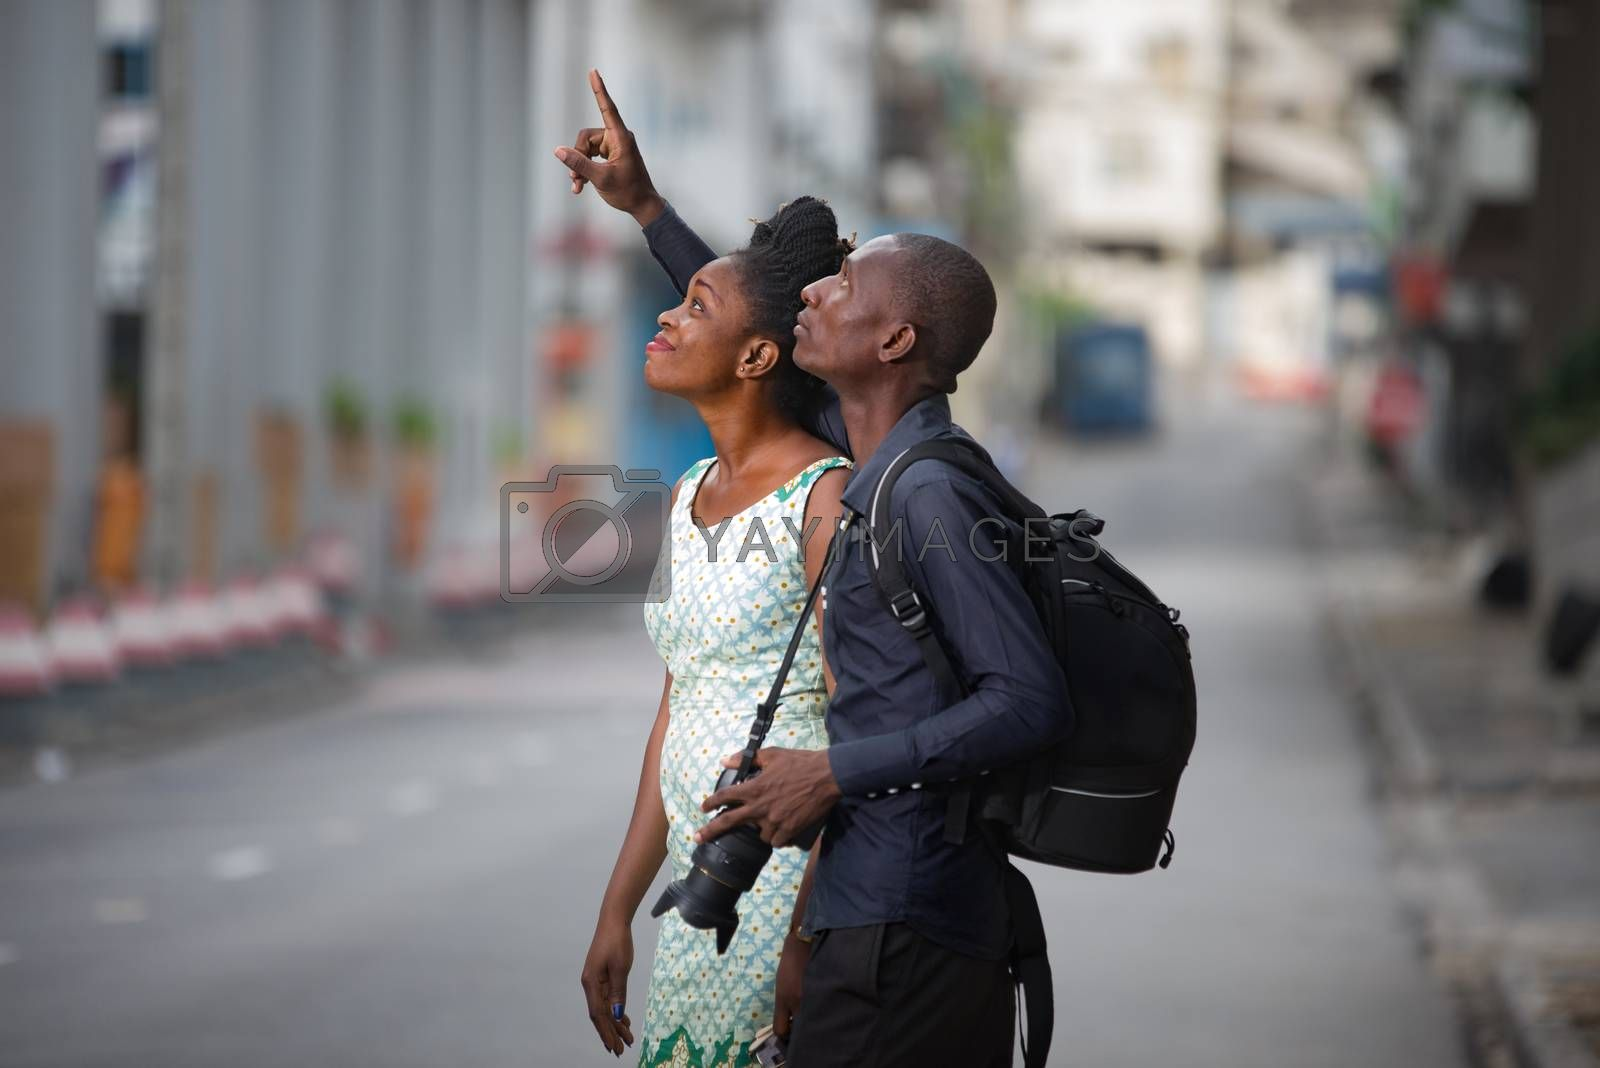 Tourist couple enjoying sightseeing and exploring city by vystek